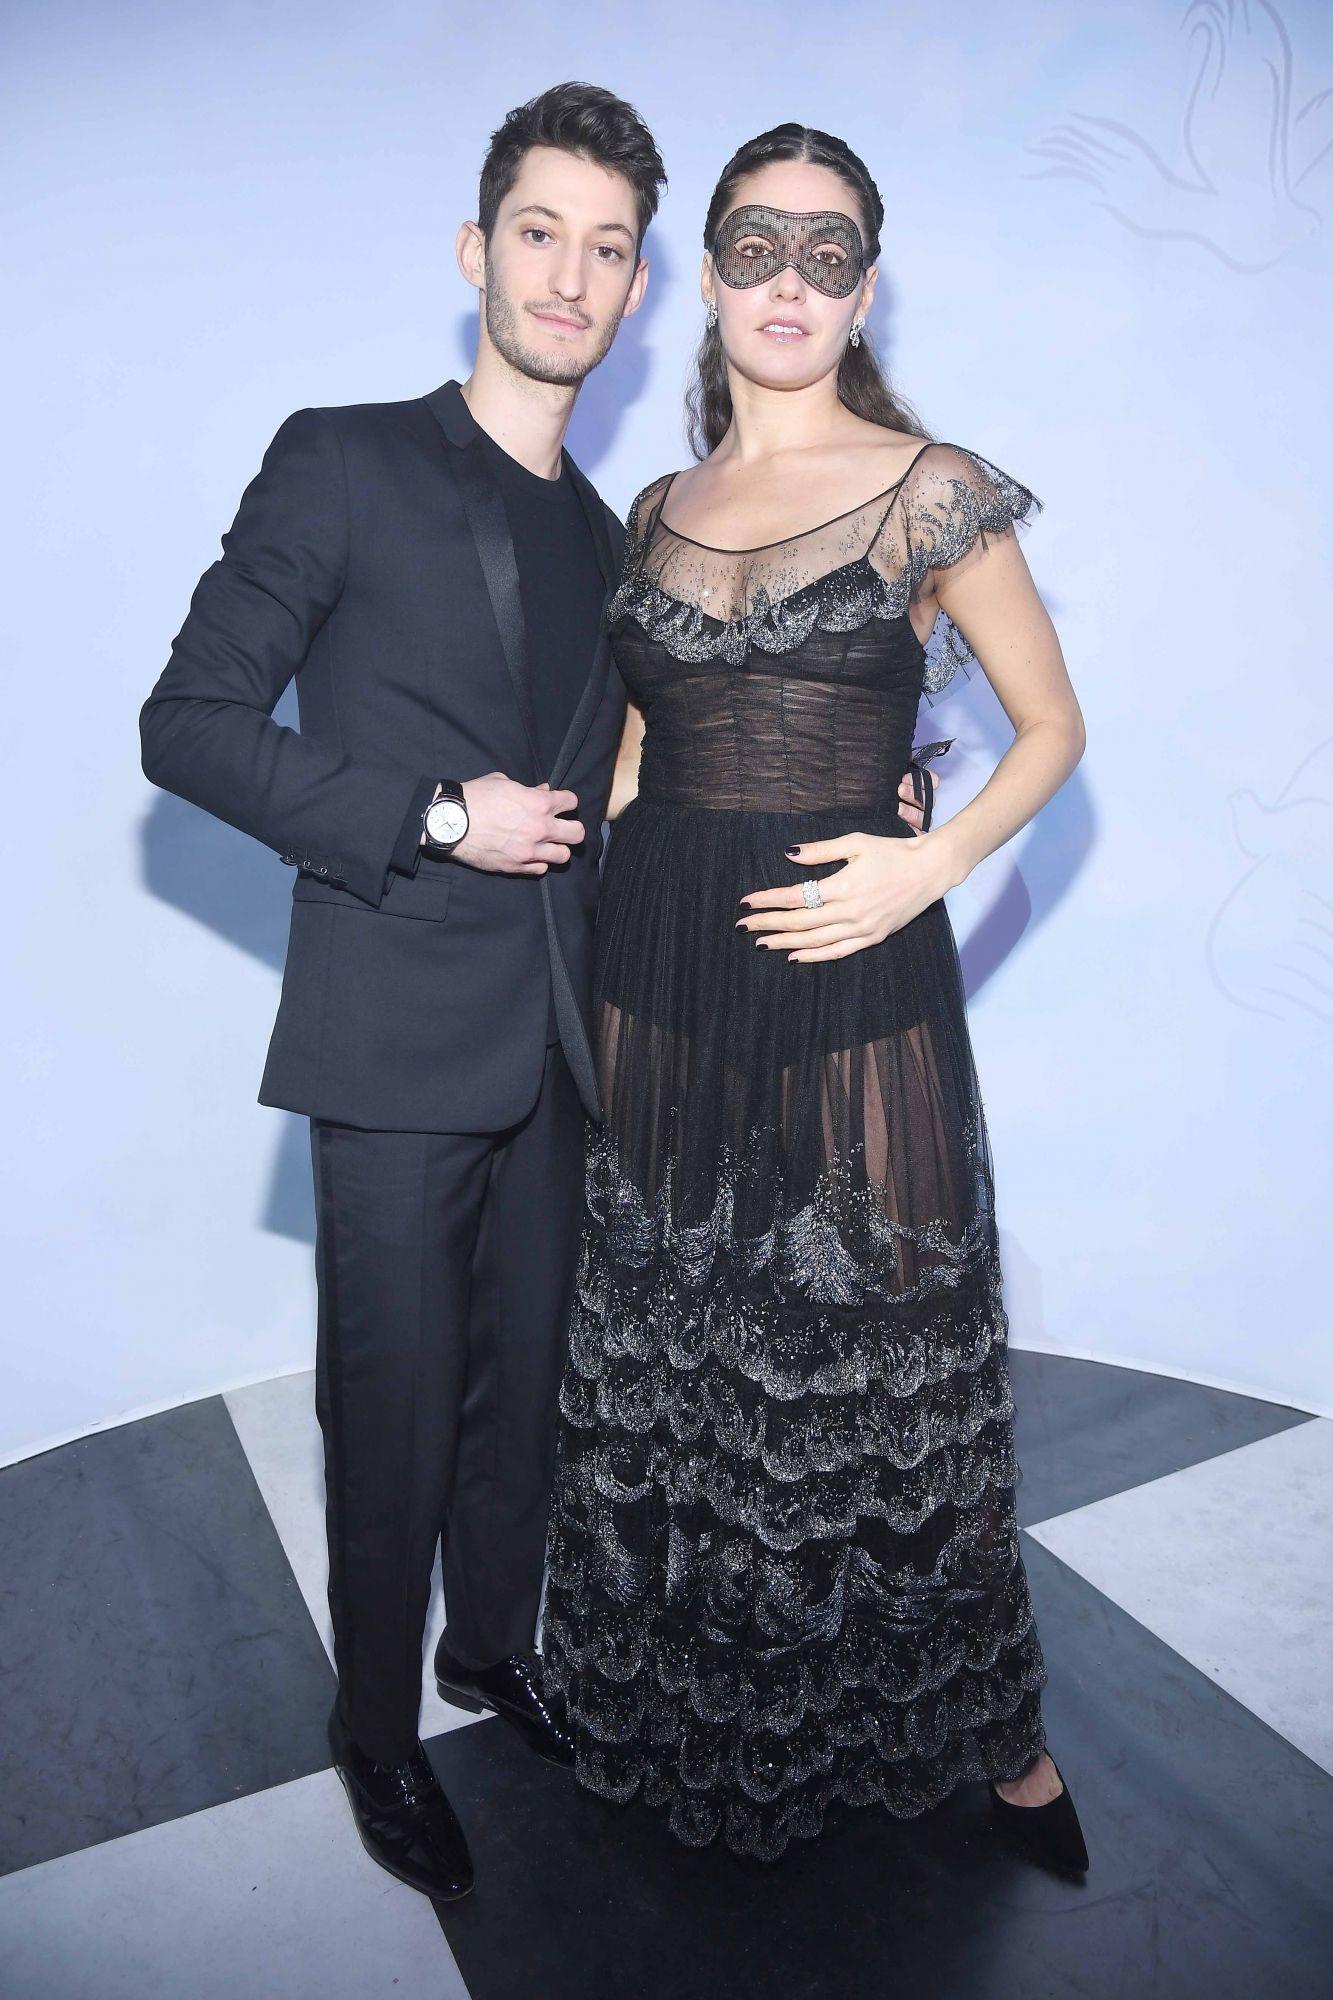 Pierre Niney & Natasha Andrews